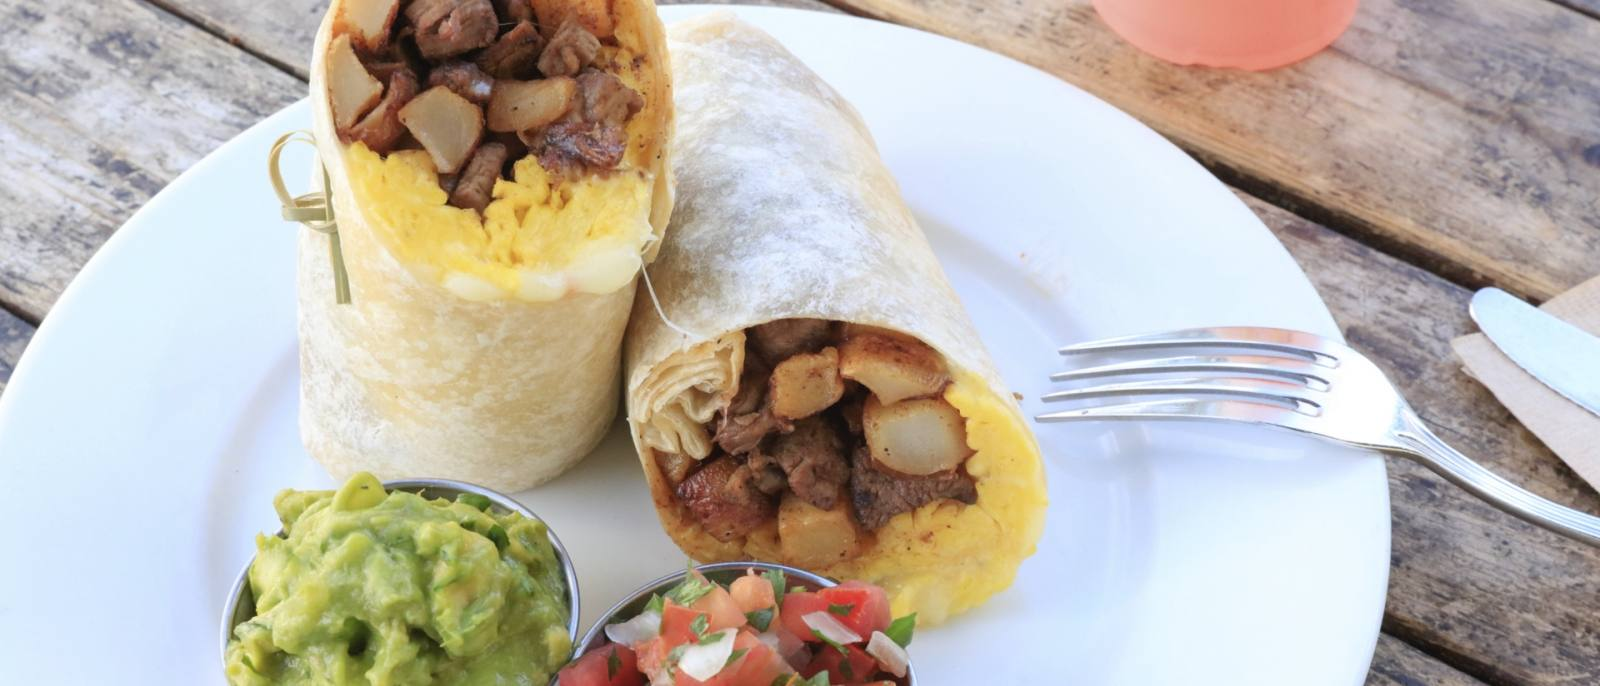 Filet Mignon Breakfast Burrito   |  Photo: Yuri Hasegawa